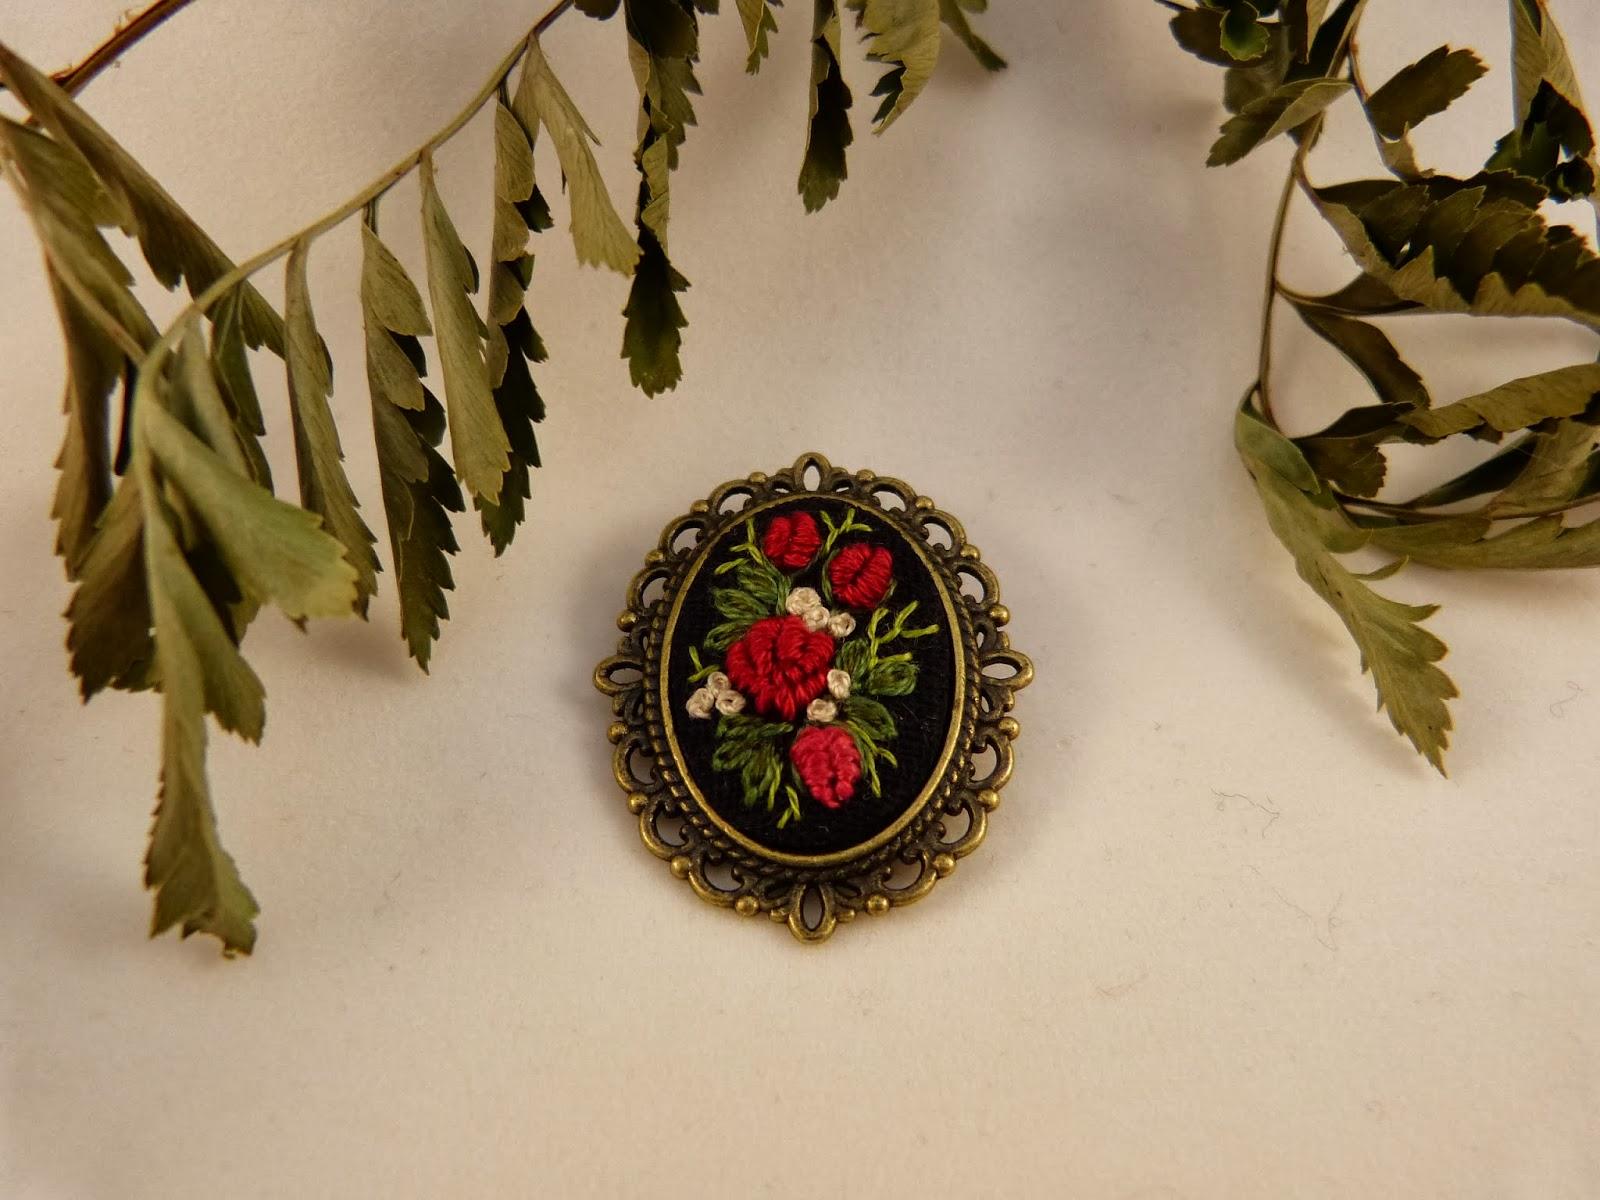 haft rococo, embroidered brooch, haftowane róże, haftowana broszka, broszka z haftem, embroidered jewerly, broszka, vintage, medalion z haftem, handmade jewerly,